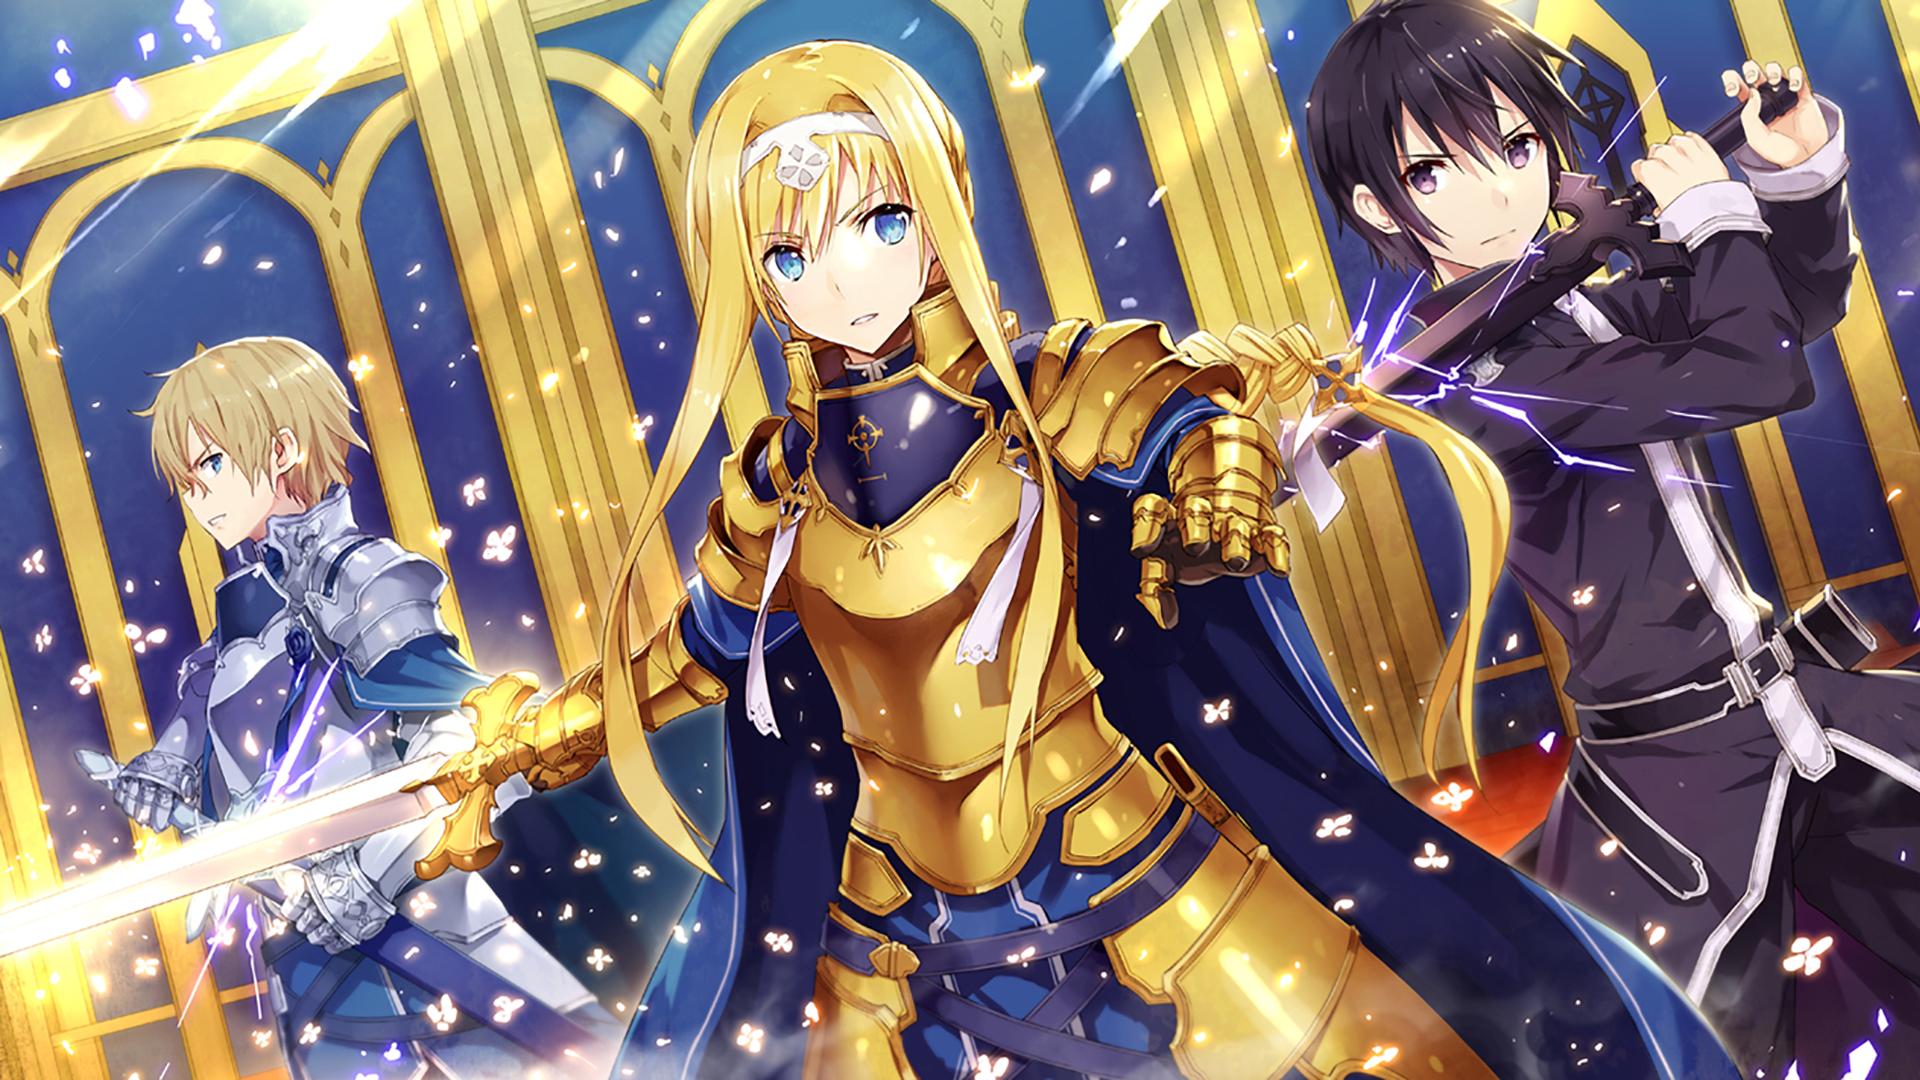 Anime Sword Art Online Alice Schuberg Kirito Sword Art Online